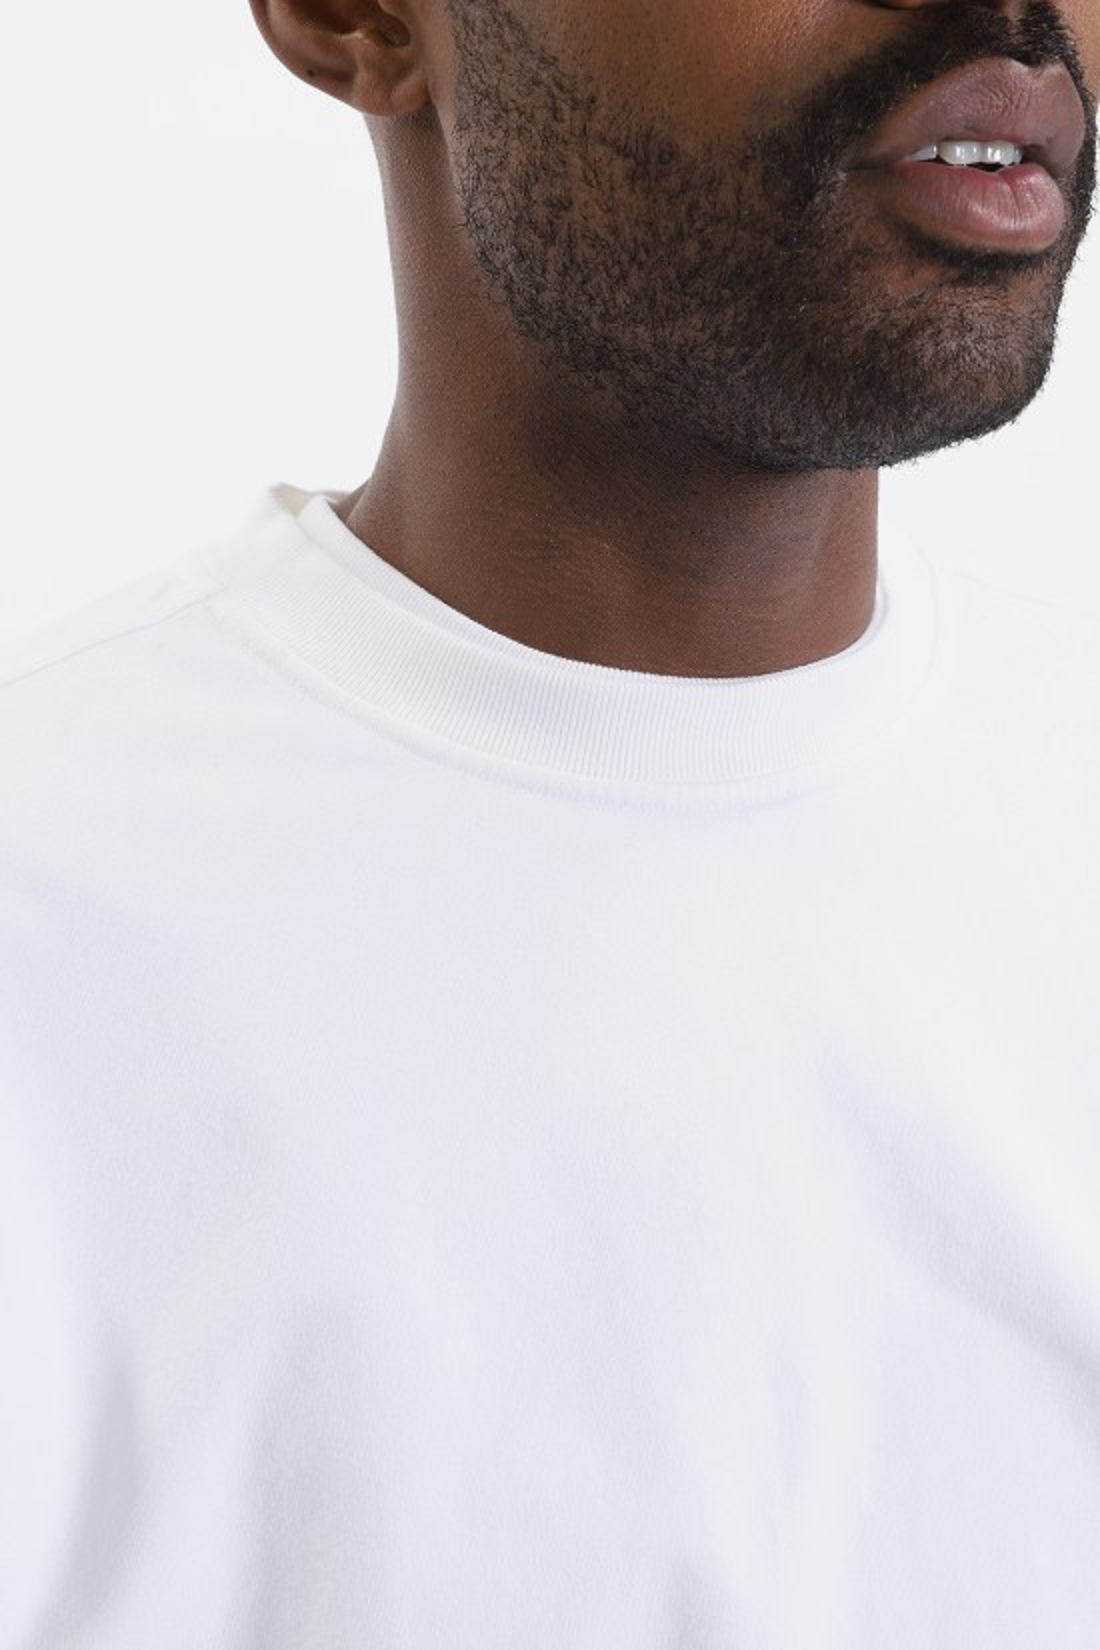 504a16304355 Stone island 61452 sweat shirt v0001 Bianco - GRADUATE STORE